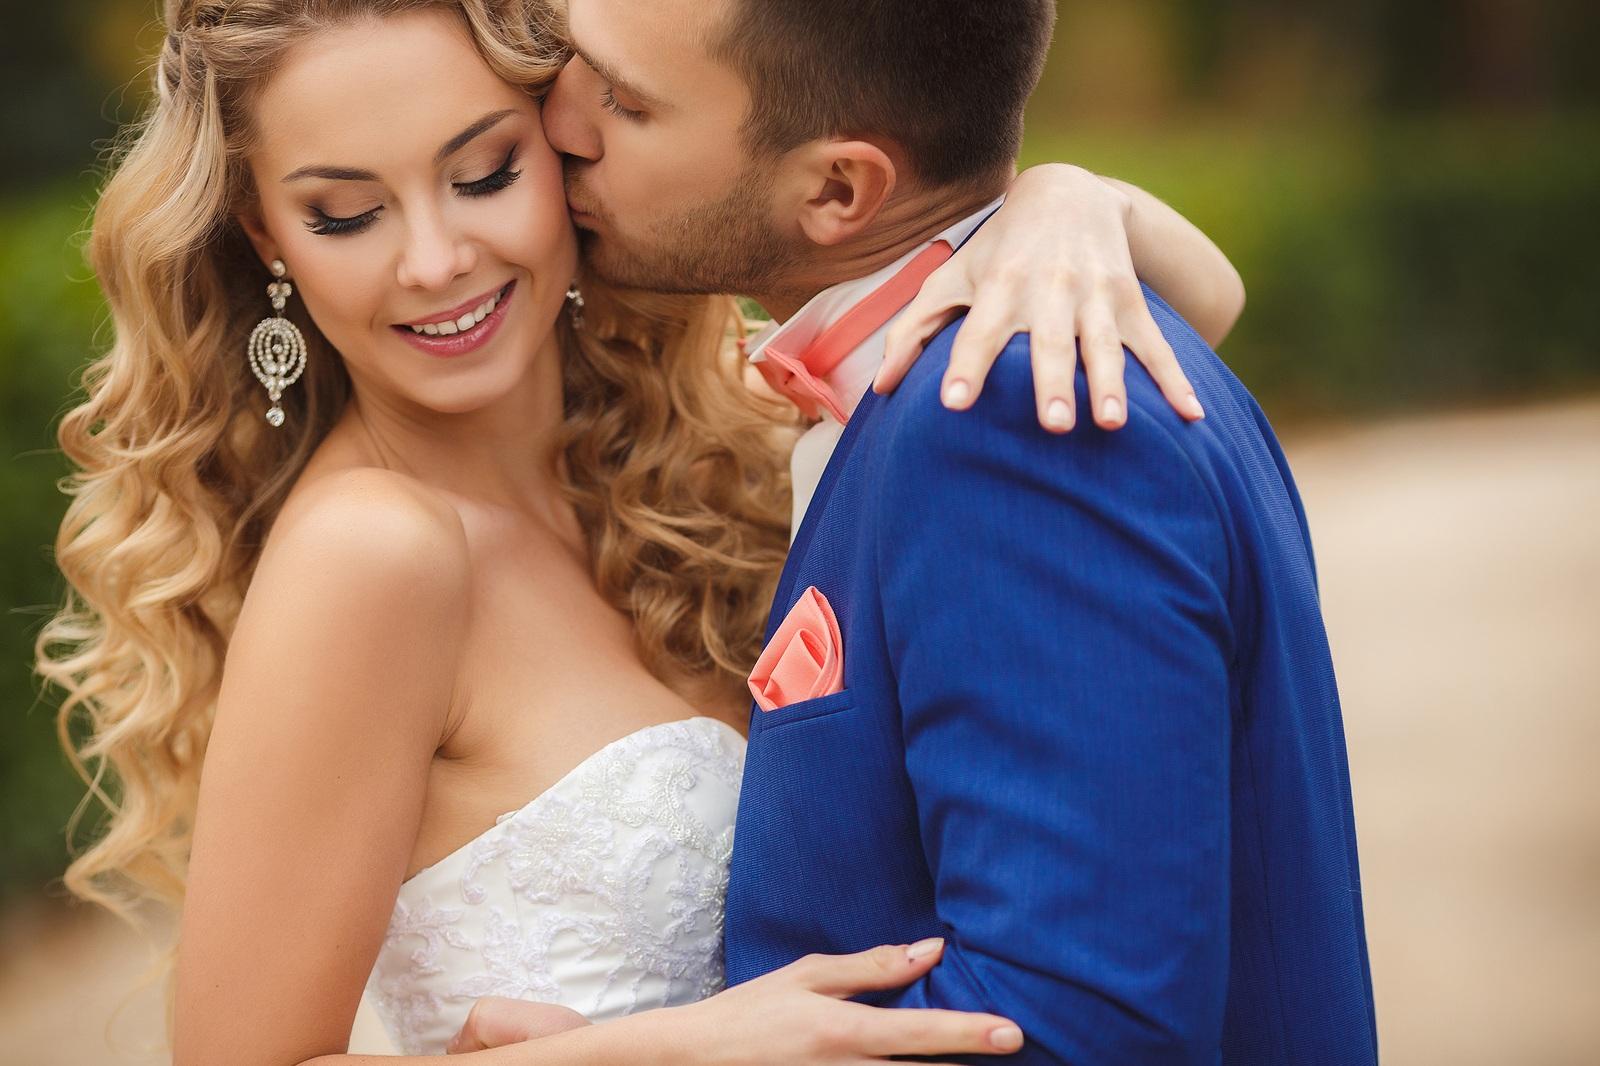 wedding-couple-smooch.jpg